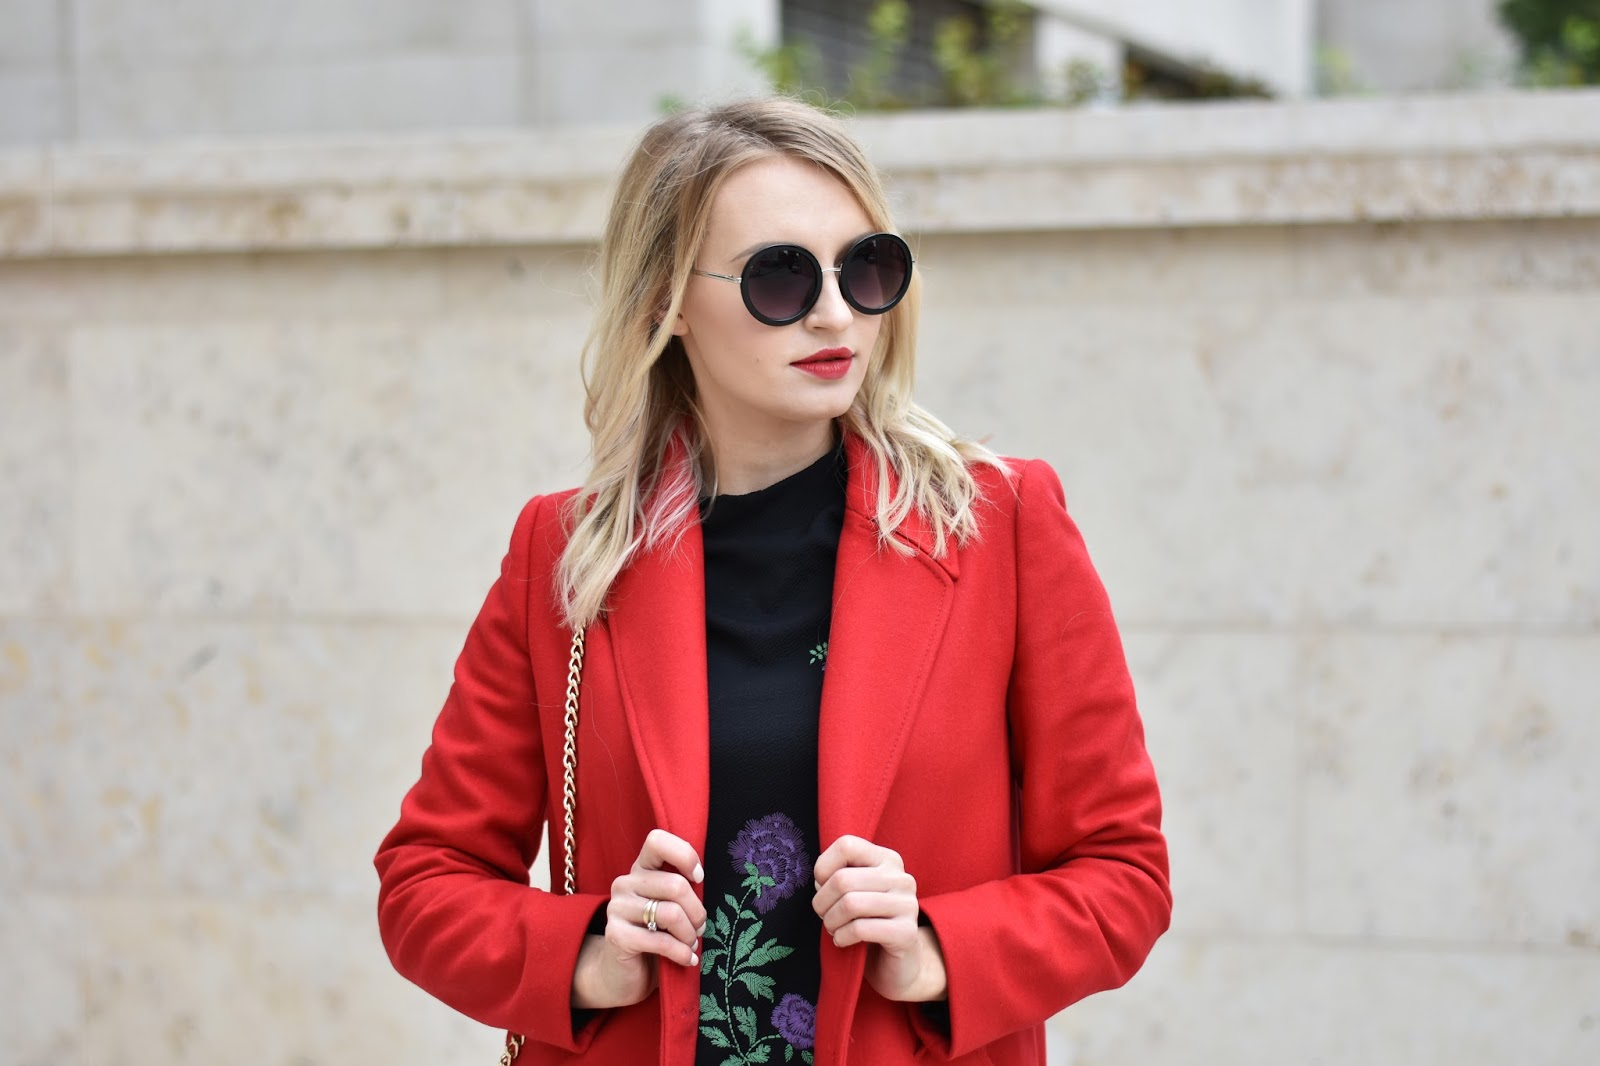 Autumn/Winter Fashion Trends 2017/2018 - FOLK